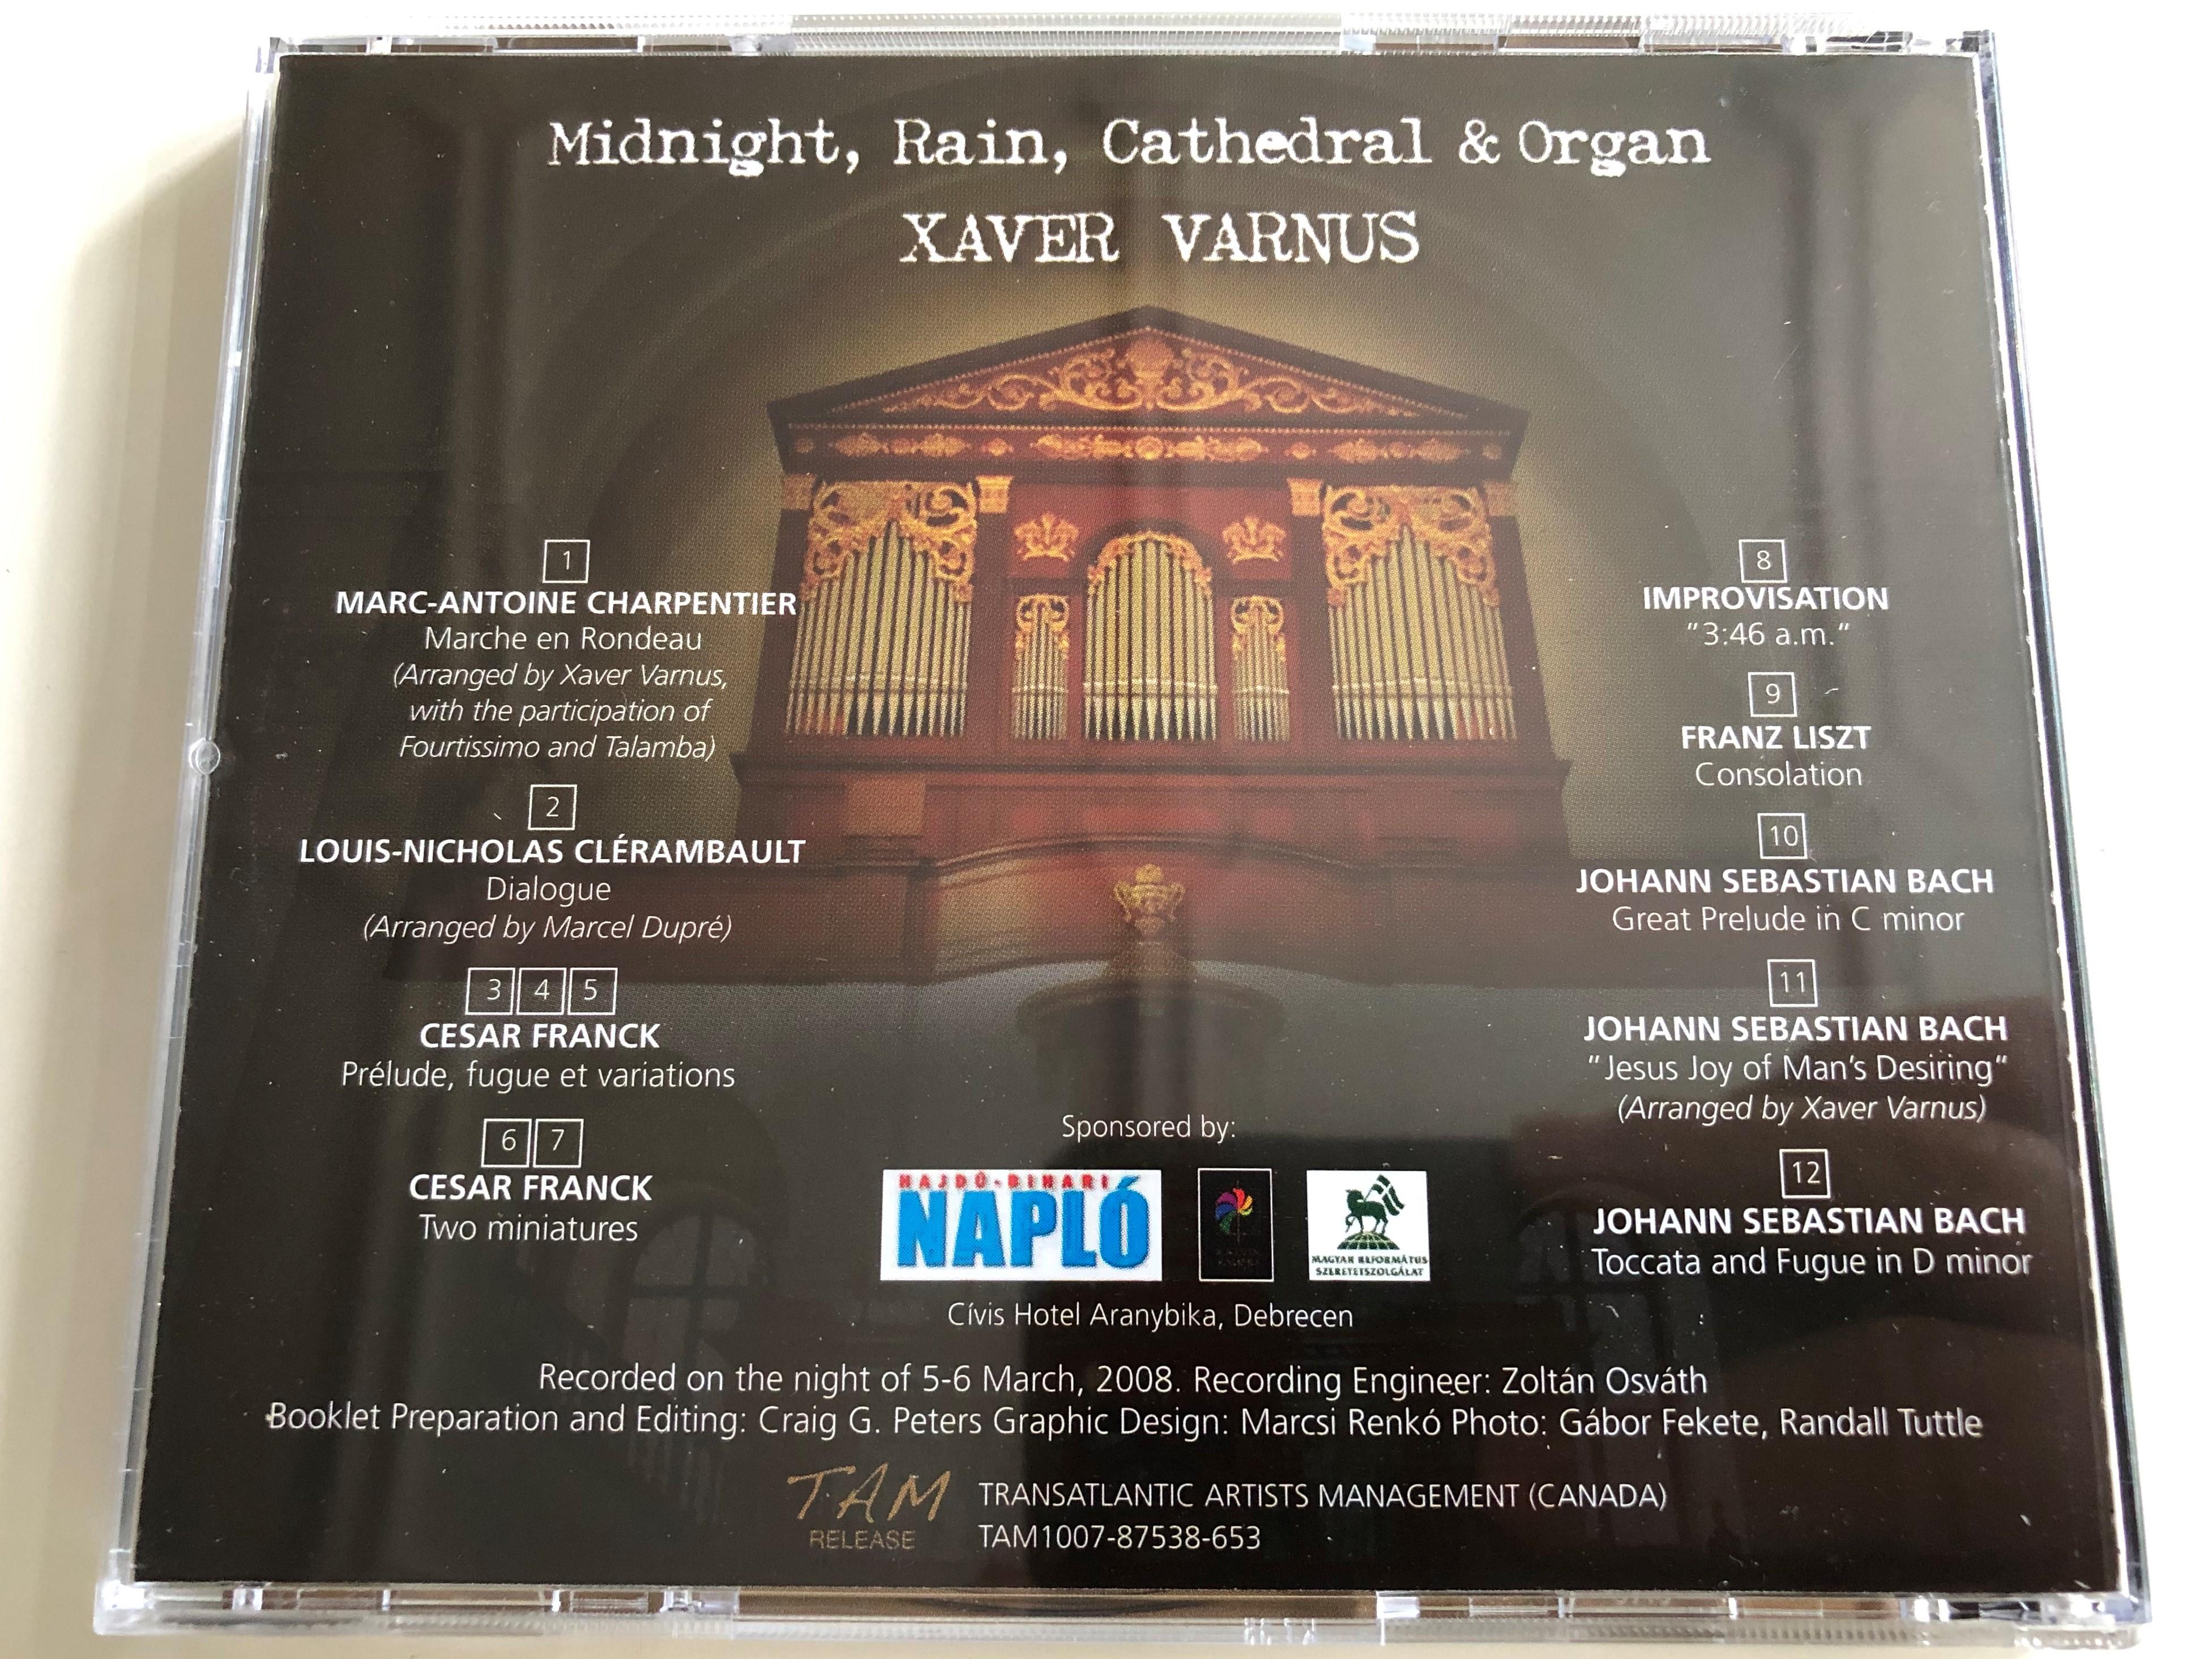 xaver-vanus-midnight-rain-cathedral-organ-the-legendary-virtuoso-plays-the-organ-of-the-debrecen-great-presbyterian-church-audio-cd-2008-tam-release-tam-1007-87538-653-6-.jpg